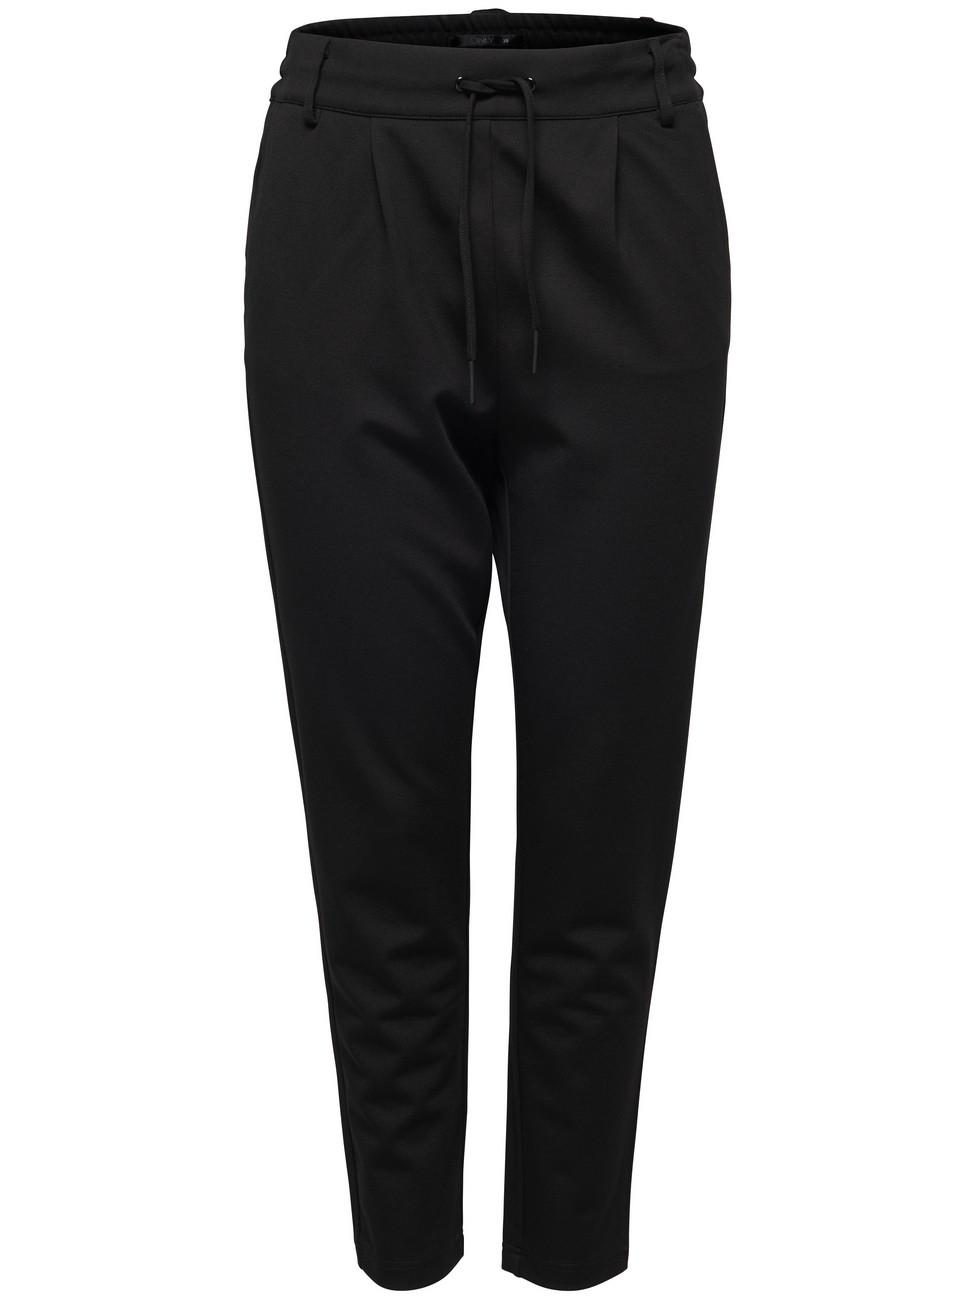 56251bdd2c7be9 Only Damen Hose onlPOPTRASH kaufen - JEANS-DIRECT.DE